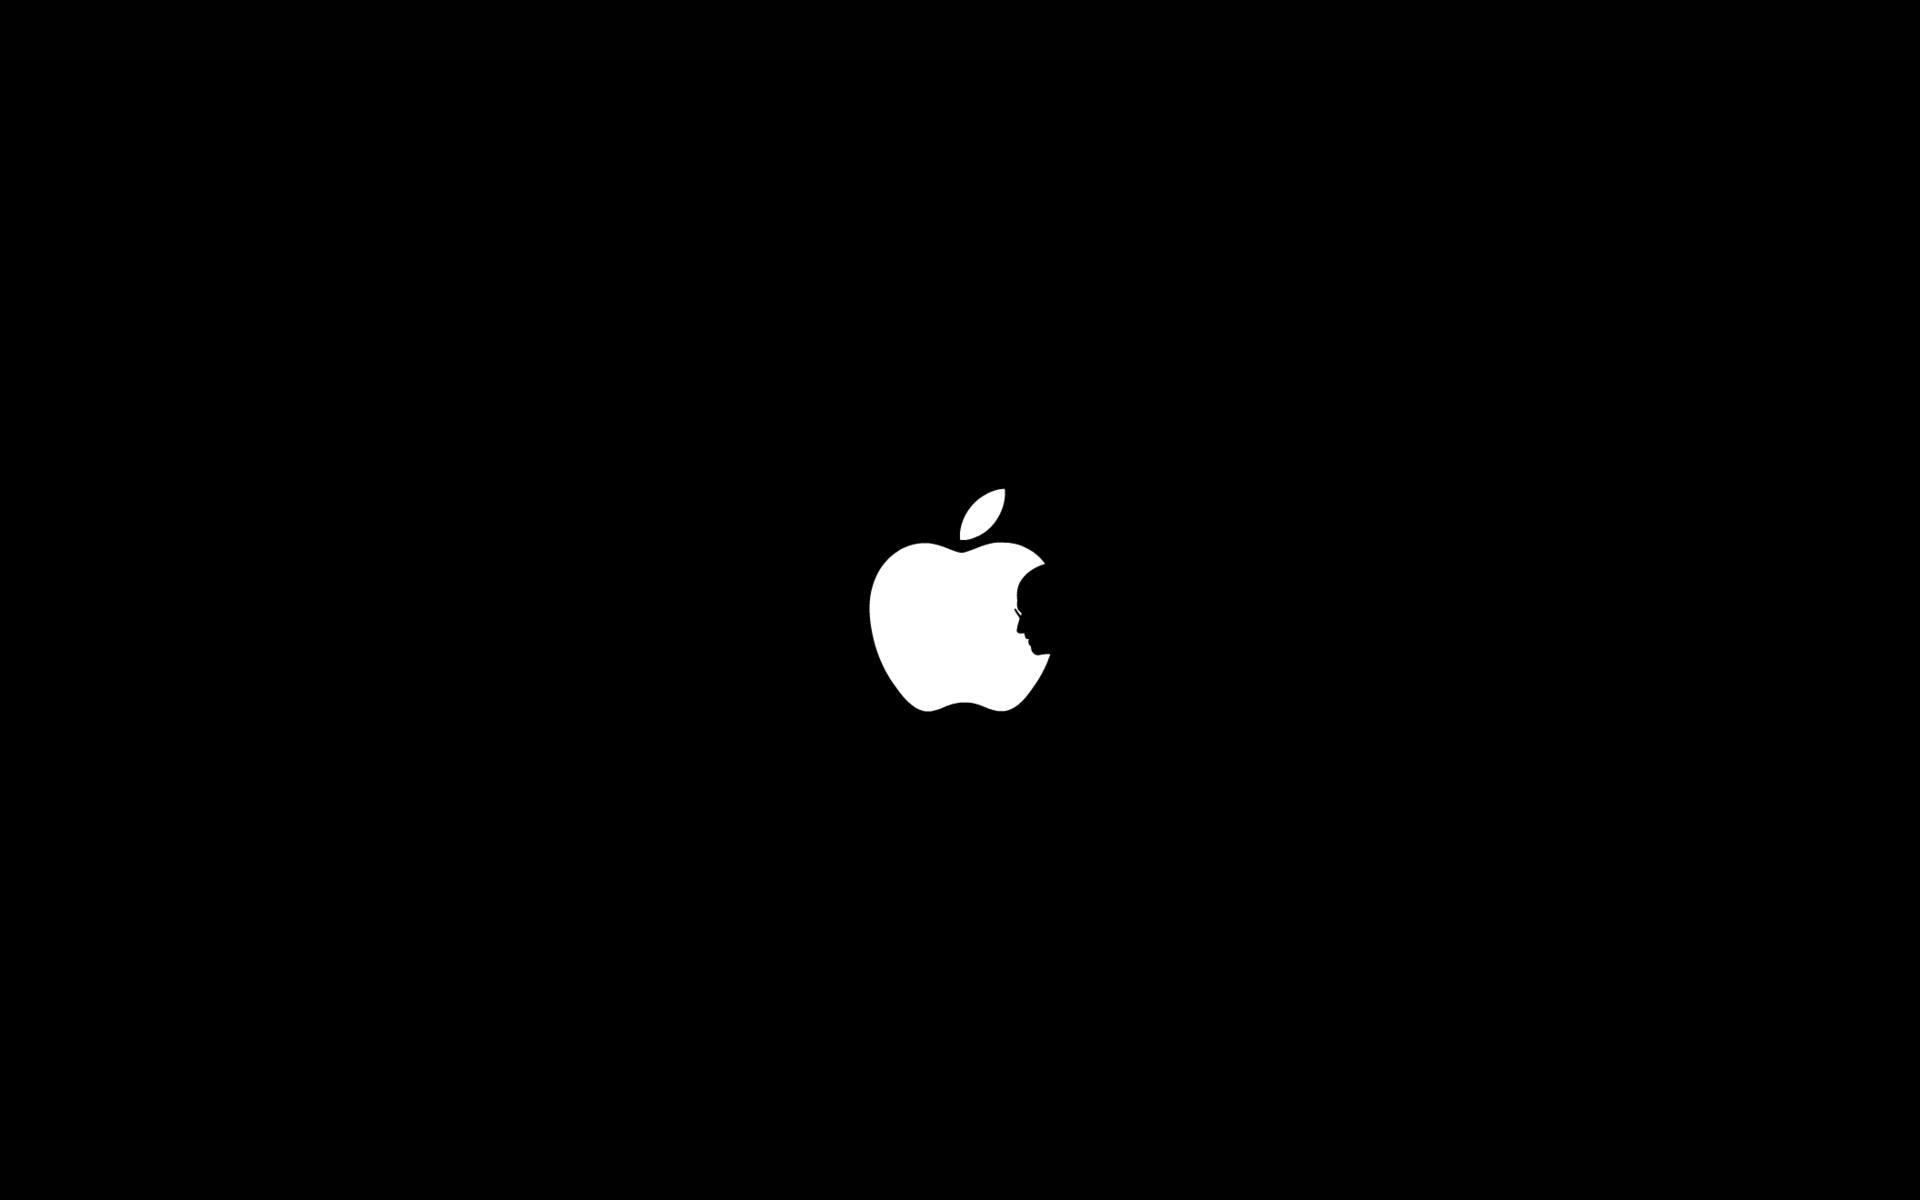 500 Apple Logo Latest Apple Logo Icon Gif Transparent Png